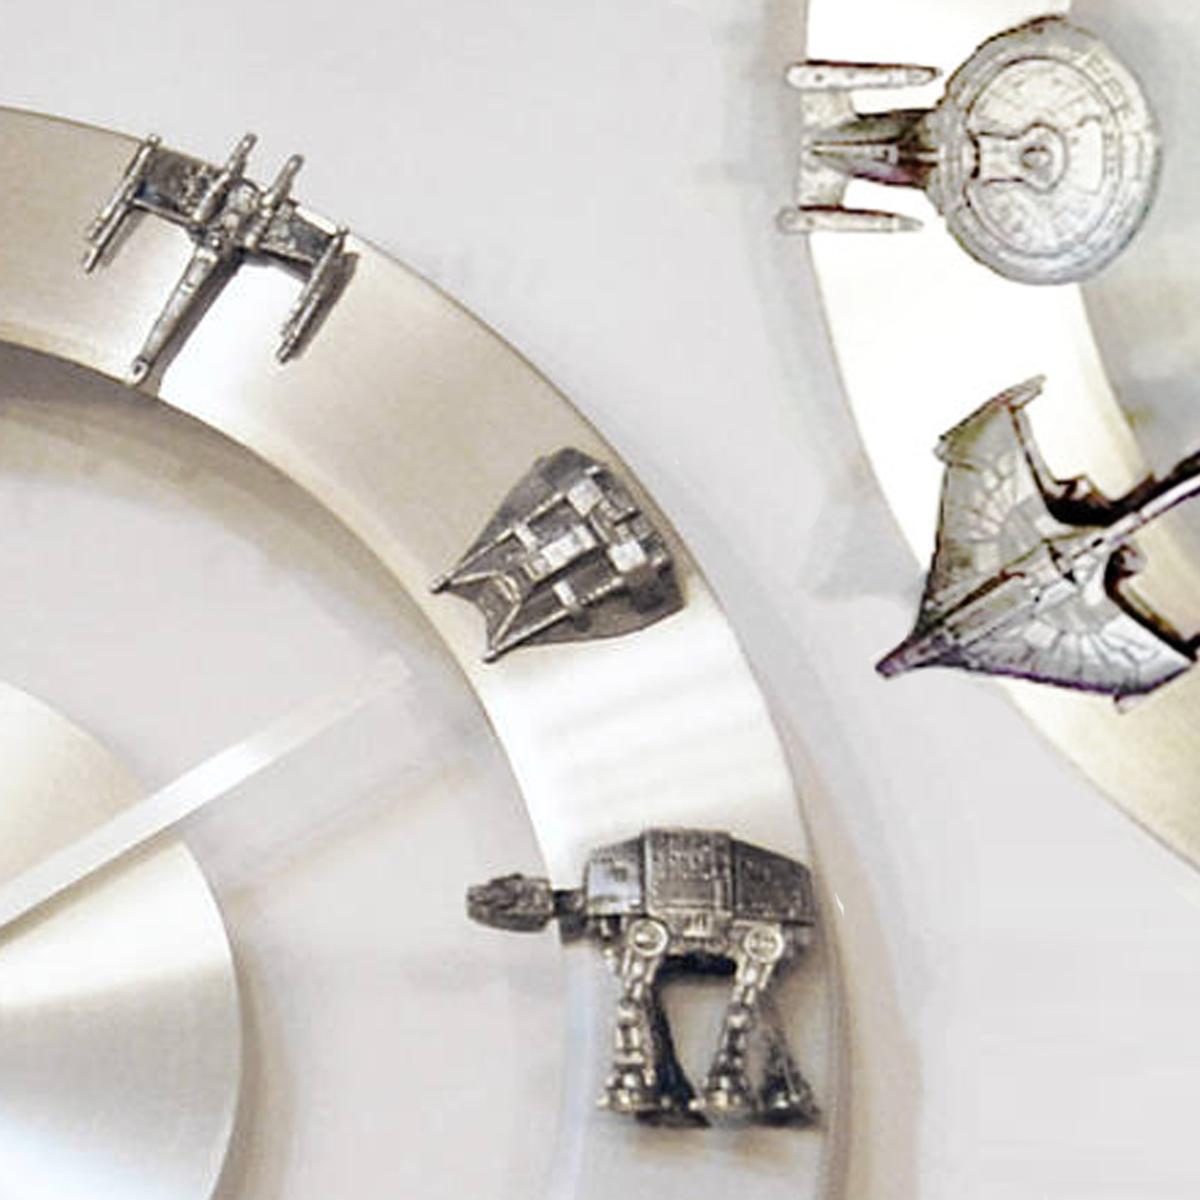 YOUgNeek Star Wars and Star Trek clocks